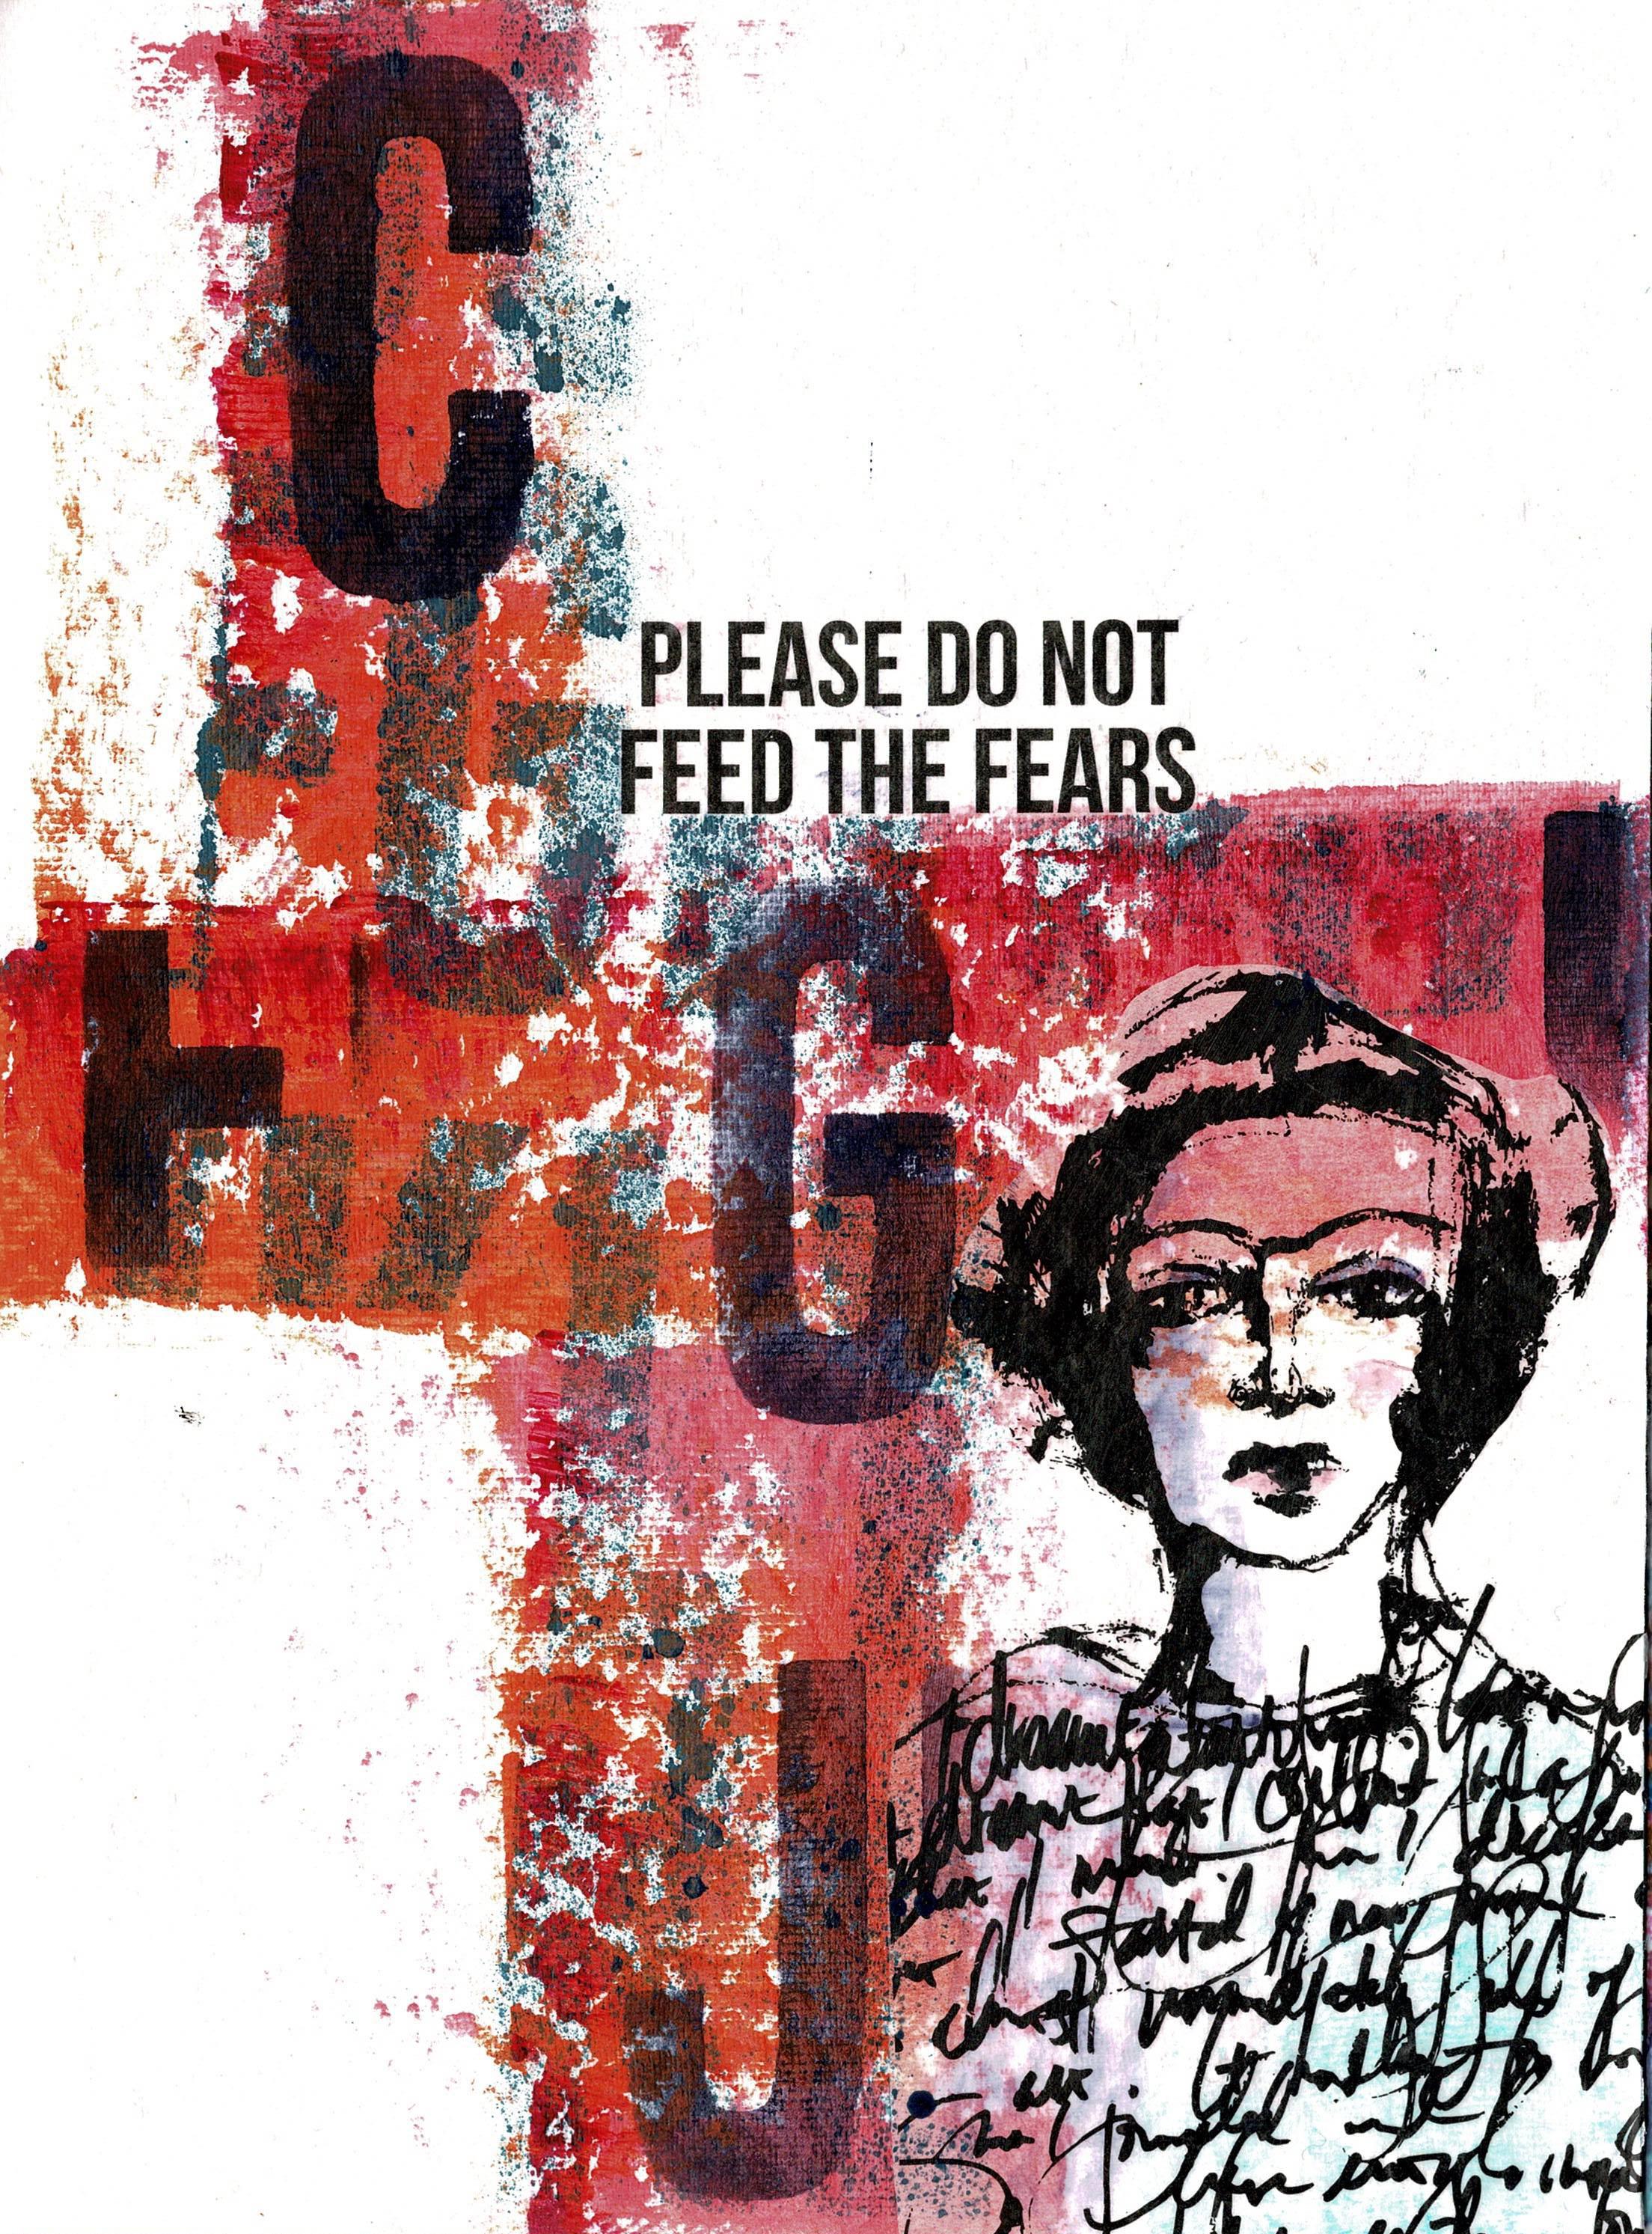 do not feed fears 2020 05 03